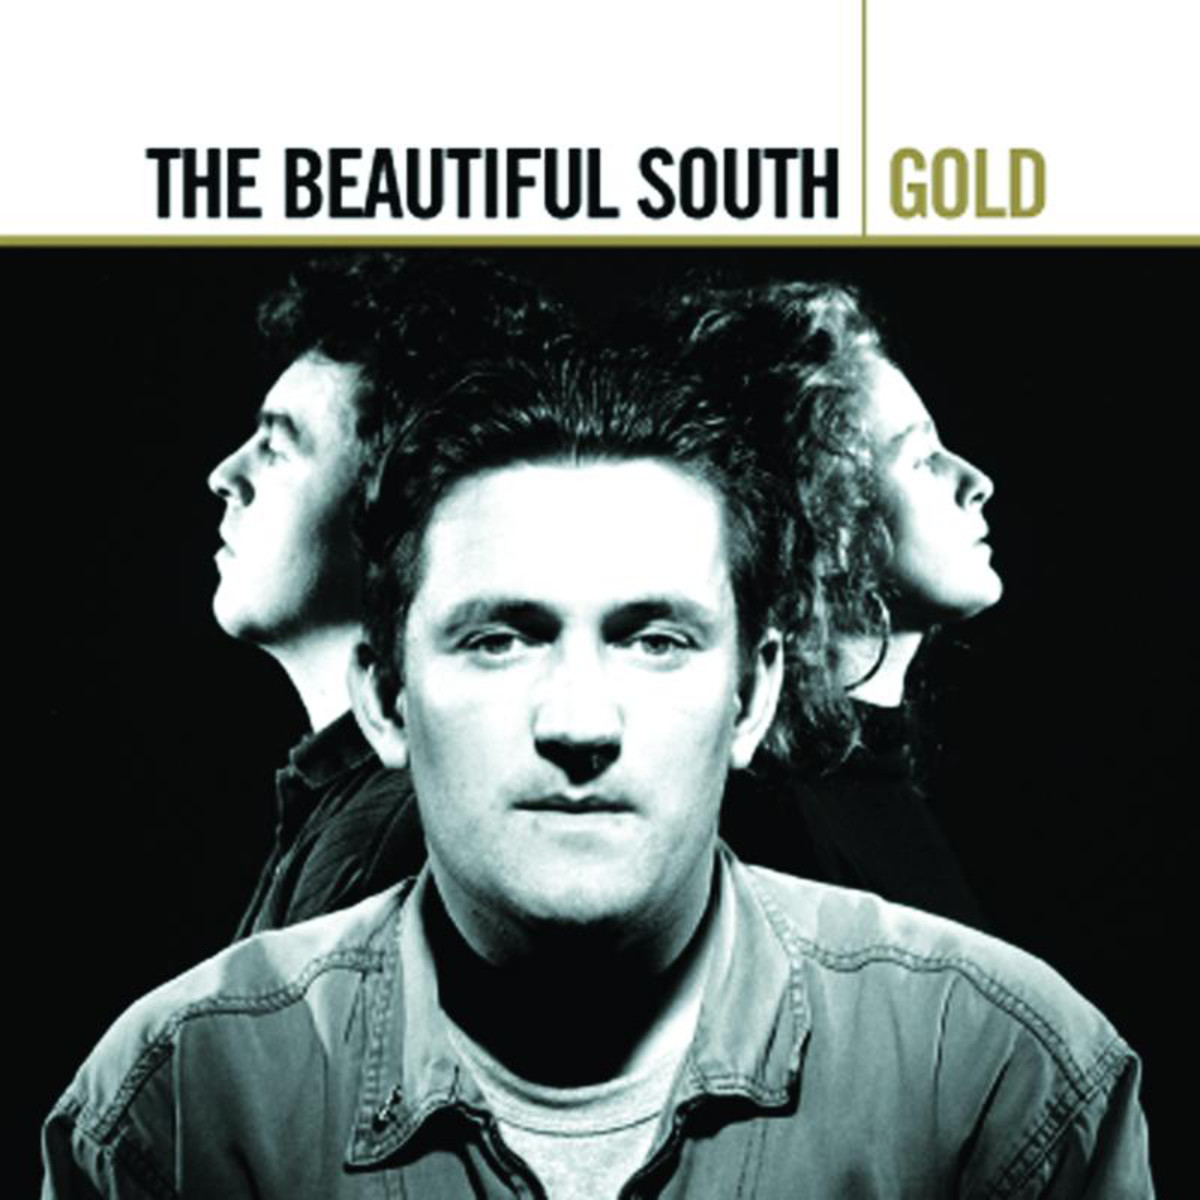 The Beautiful South: Goldの拡大画像